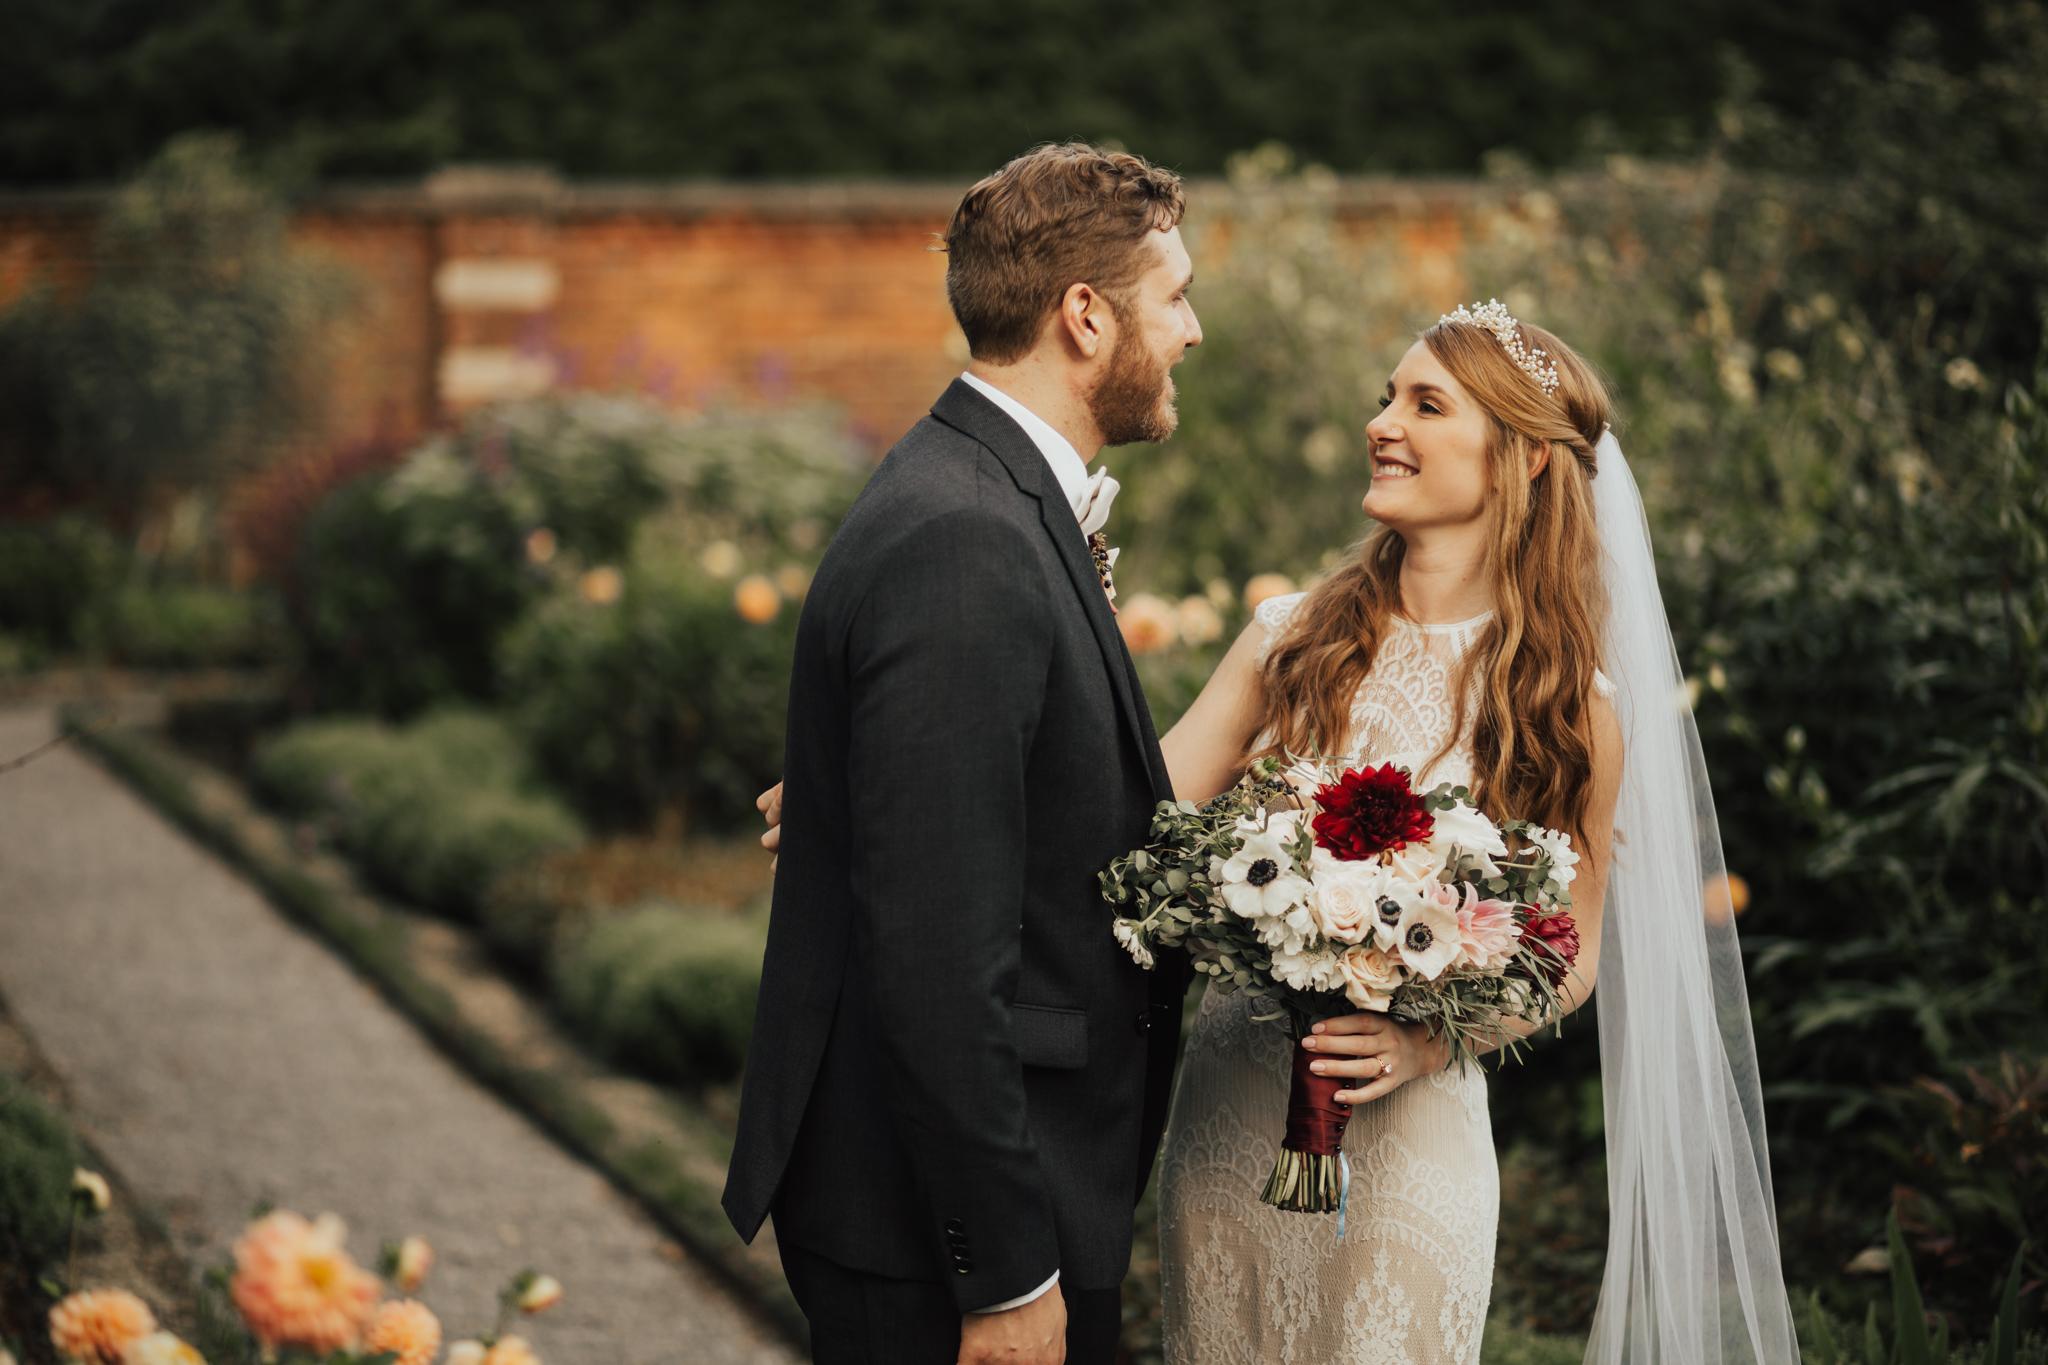 old_westbury_garden_wedding-50.jpg